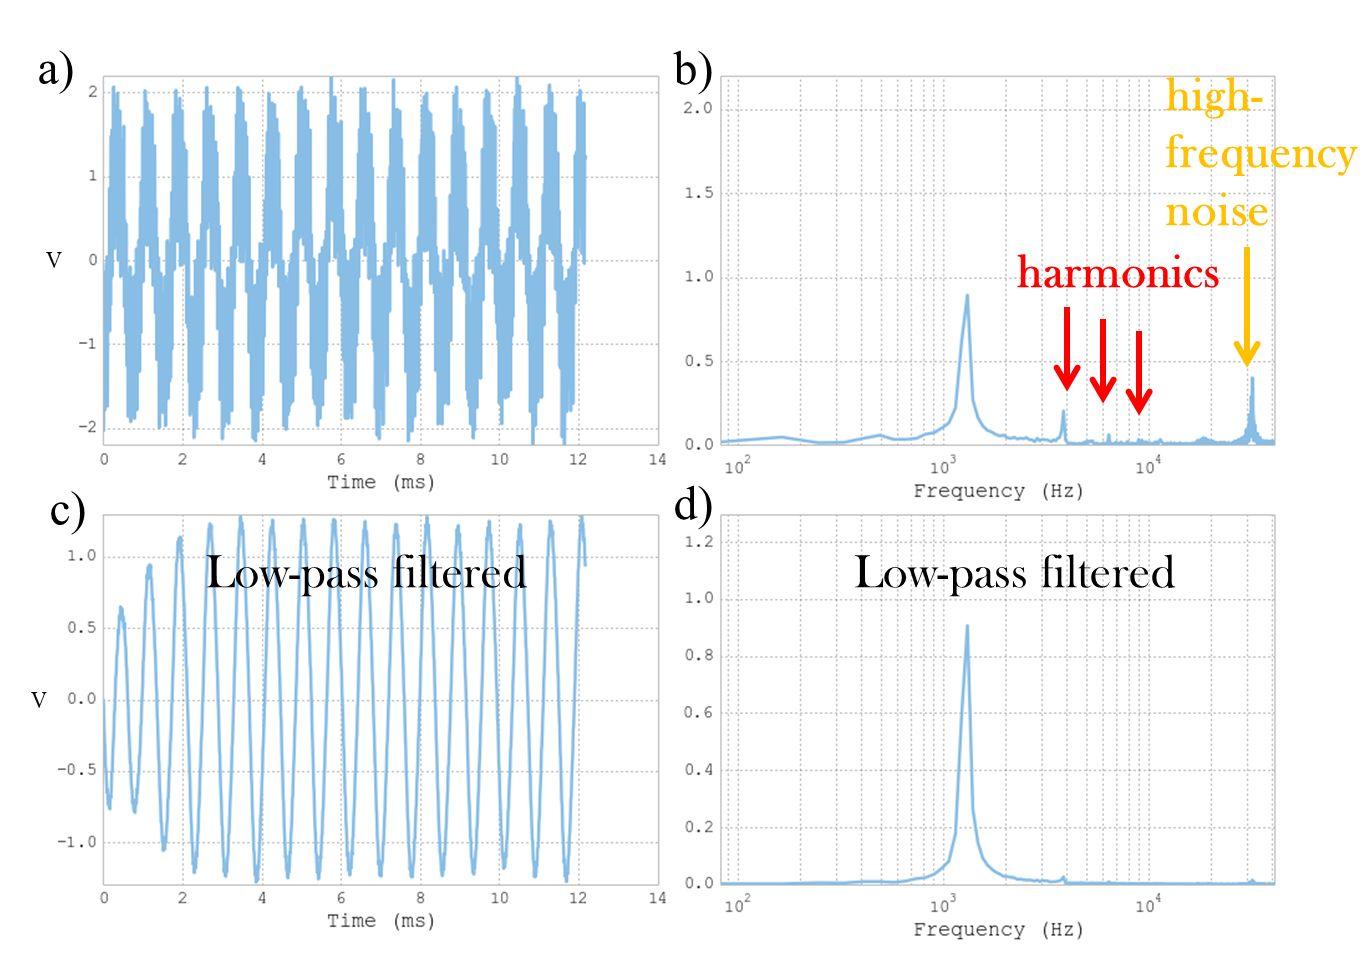 http://microfluidics.utoronto.ca/dropbot/media/anti-aliasing_filter/feedback_signal_FFT_(noisy_and_filtered).jpg